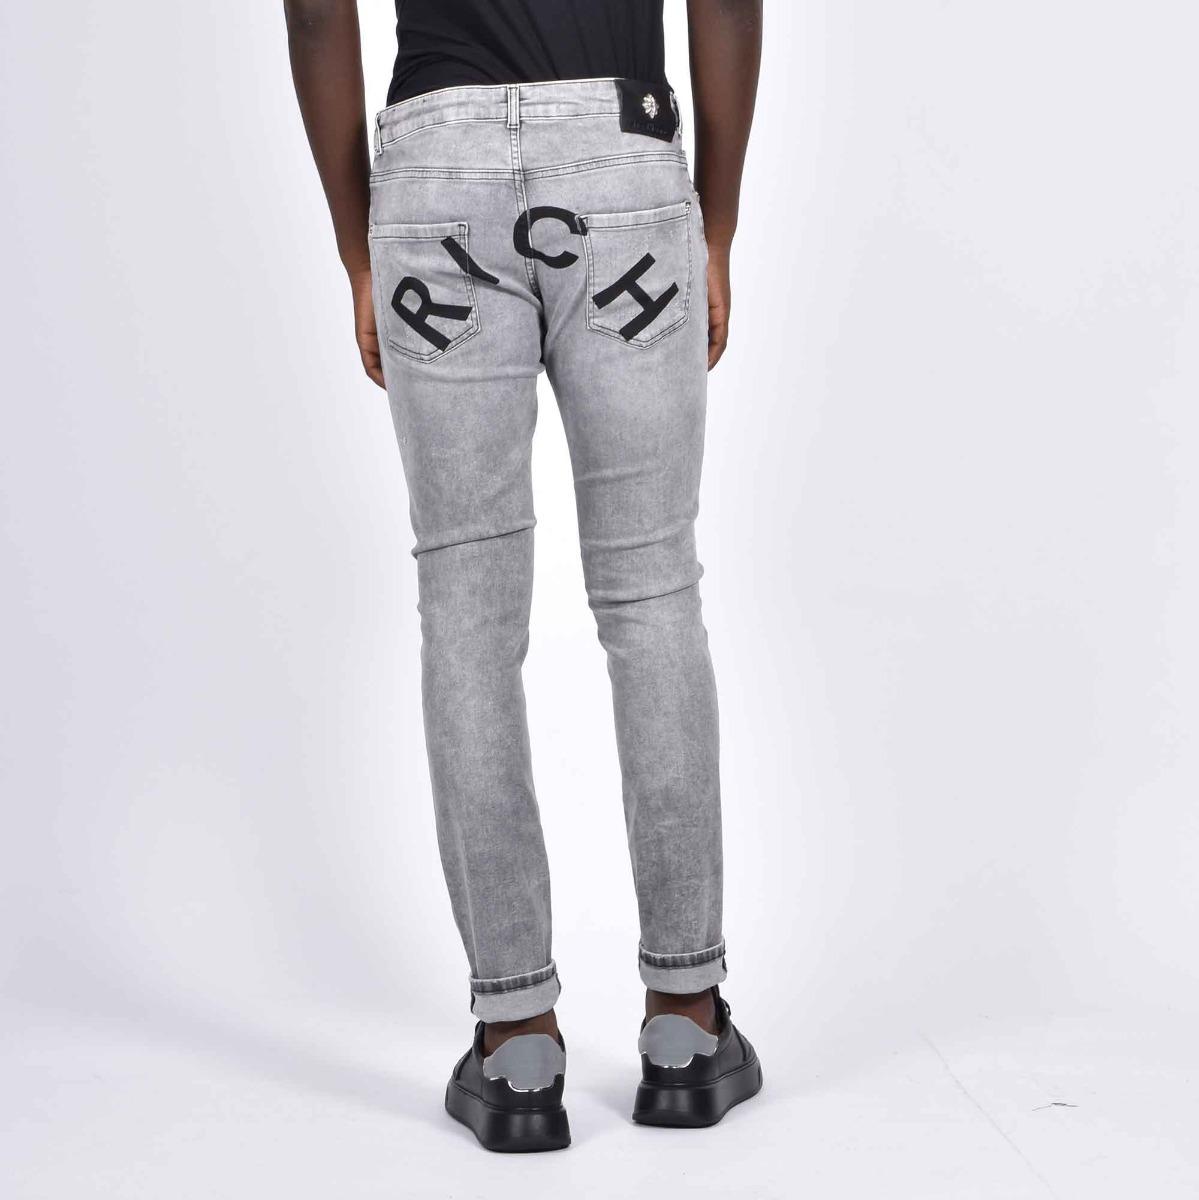 Jeans halland scritta rich - Denim grigio